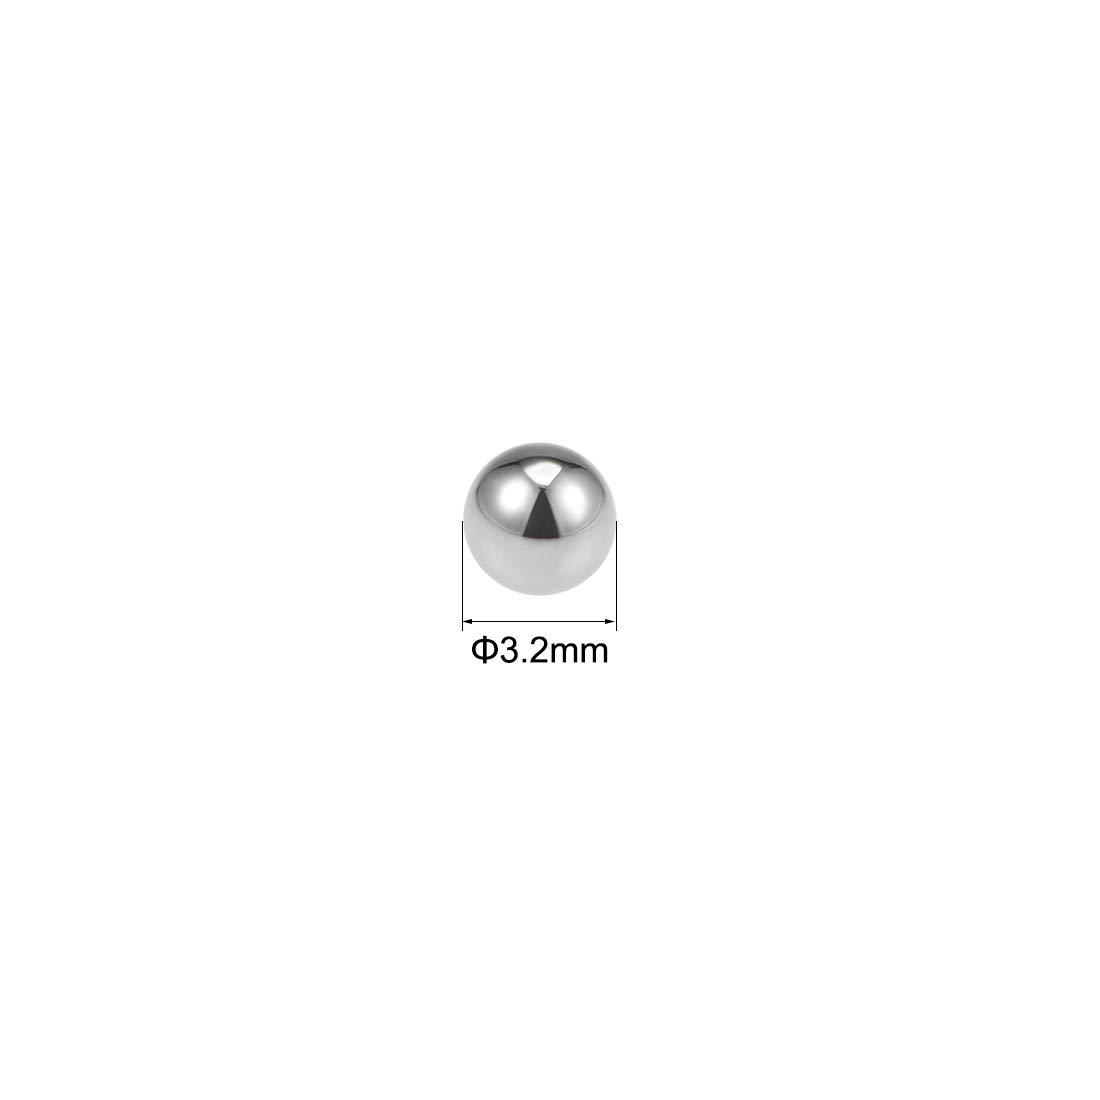 GCr15 uxcell 4.5mm Solid Bearing Balls Chromium Steel G10 Precision Balls 100pcs